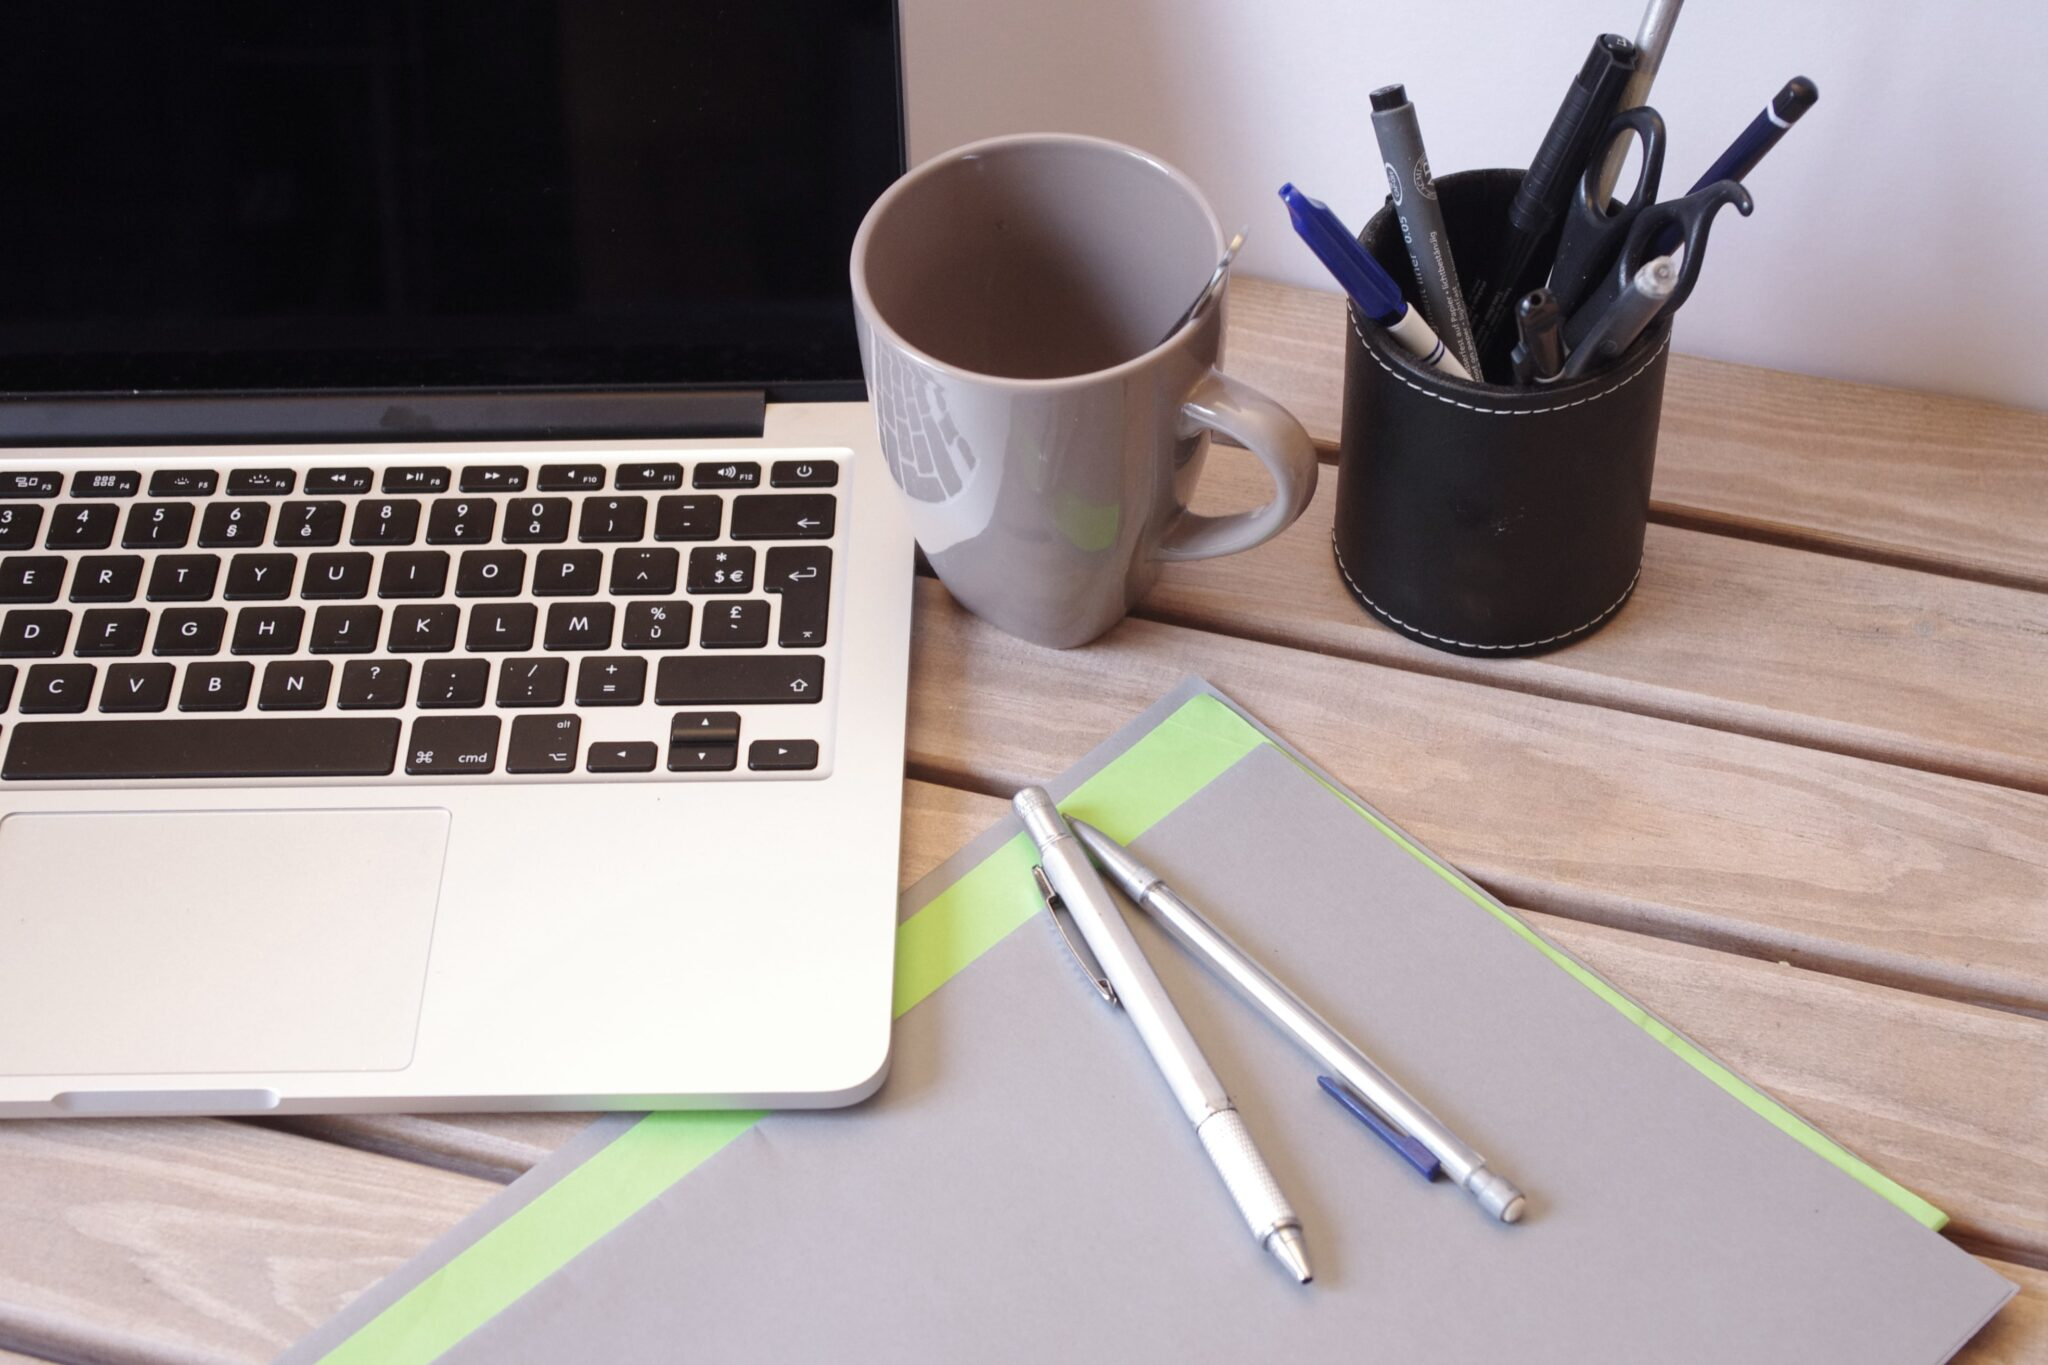 [TUTO WEBMARKETING] Comment animer efficacement sa page entreprise LinkedIn?